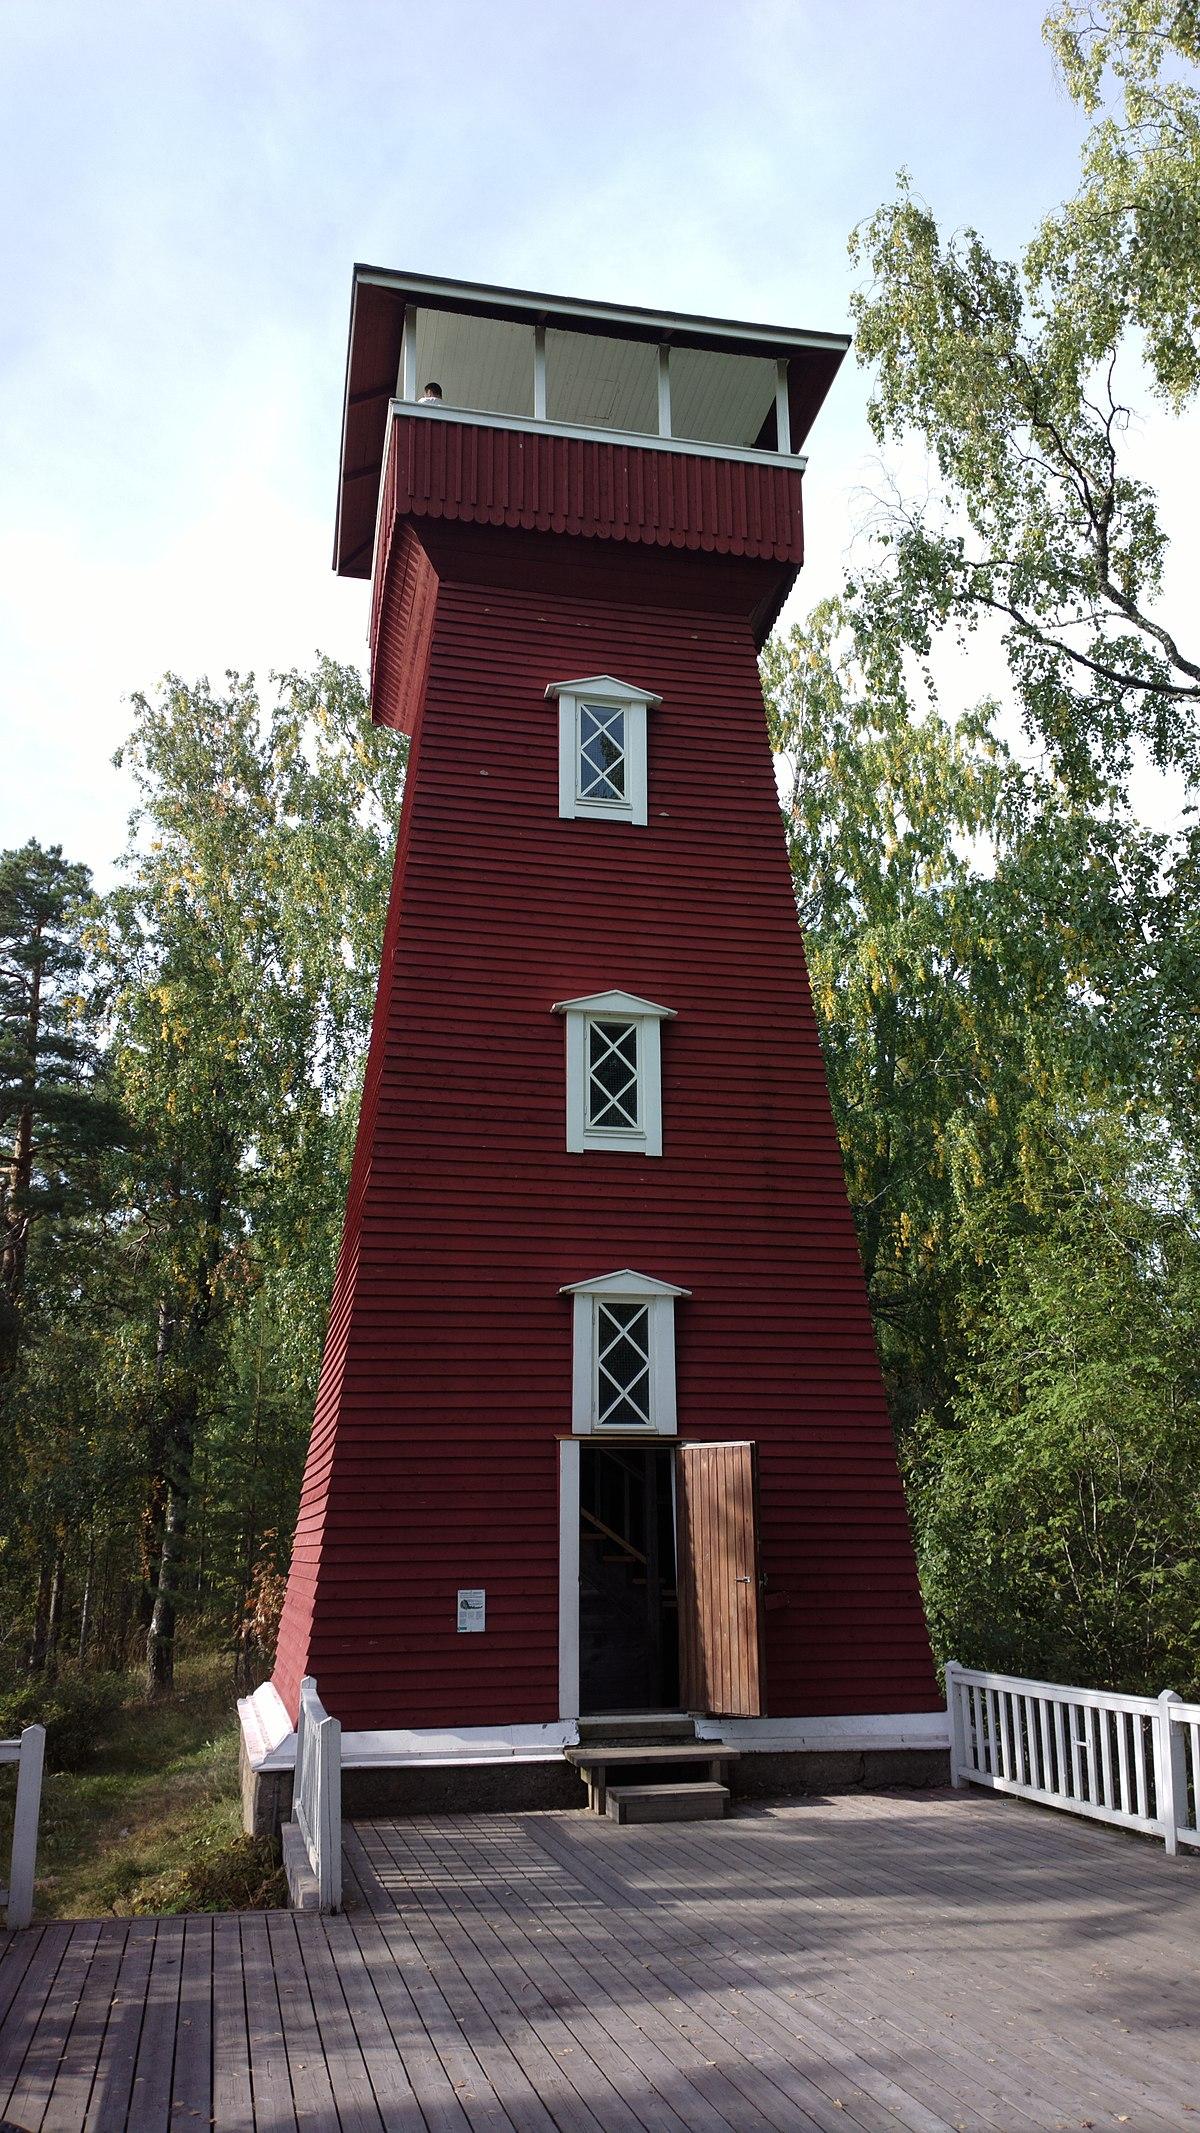 Haralanharjun Näkötorni